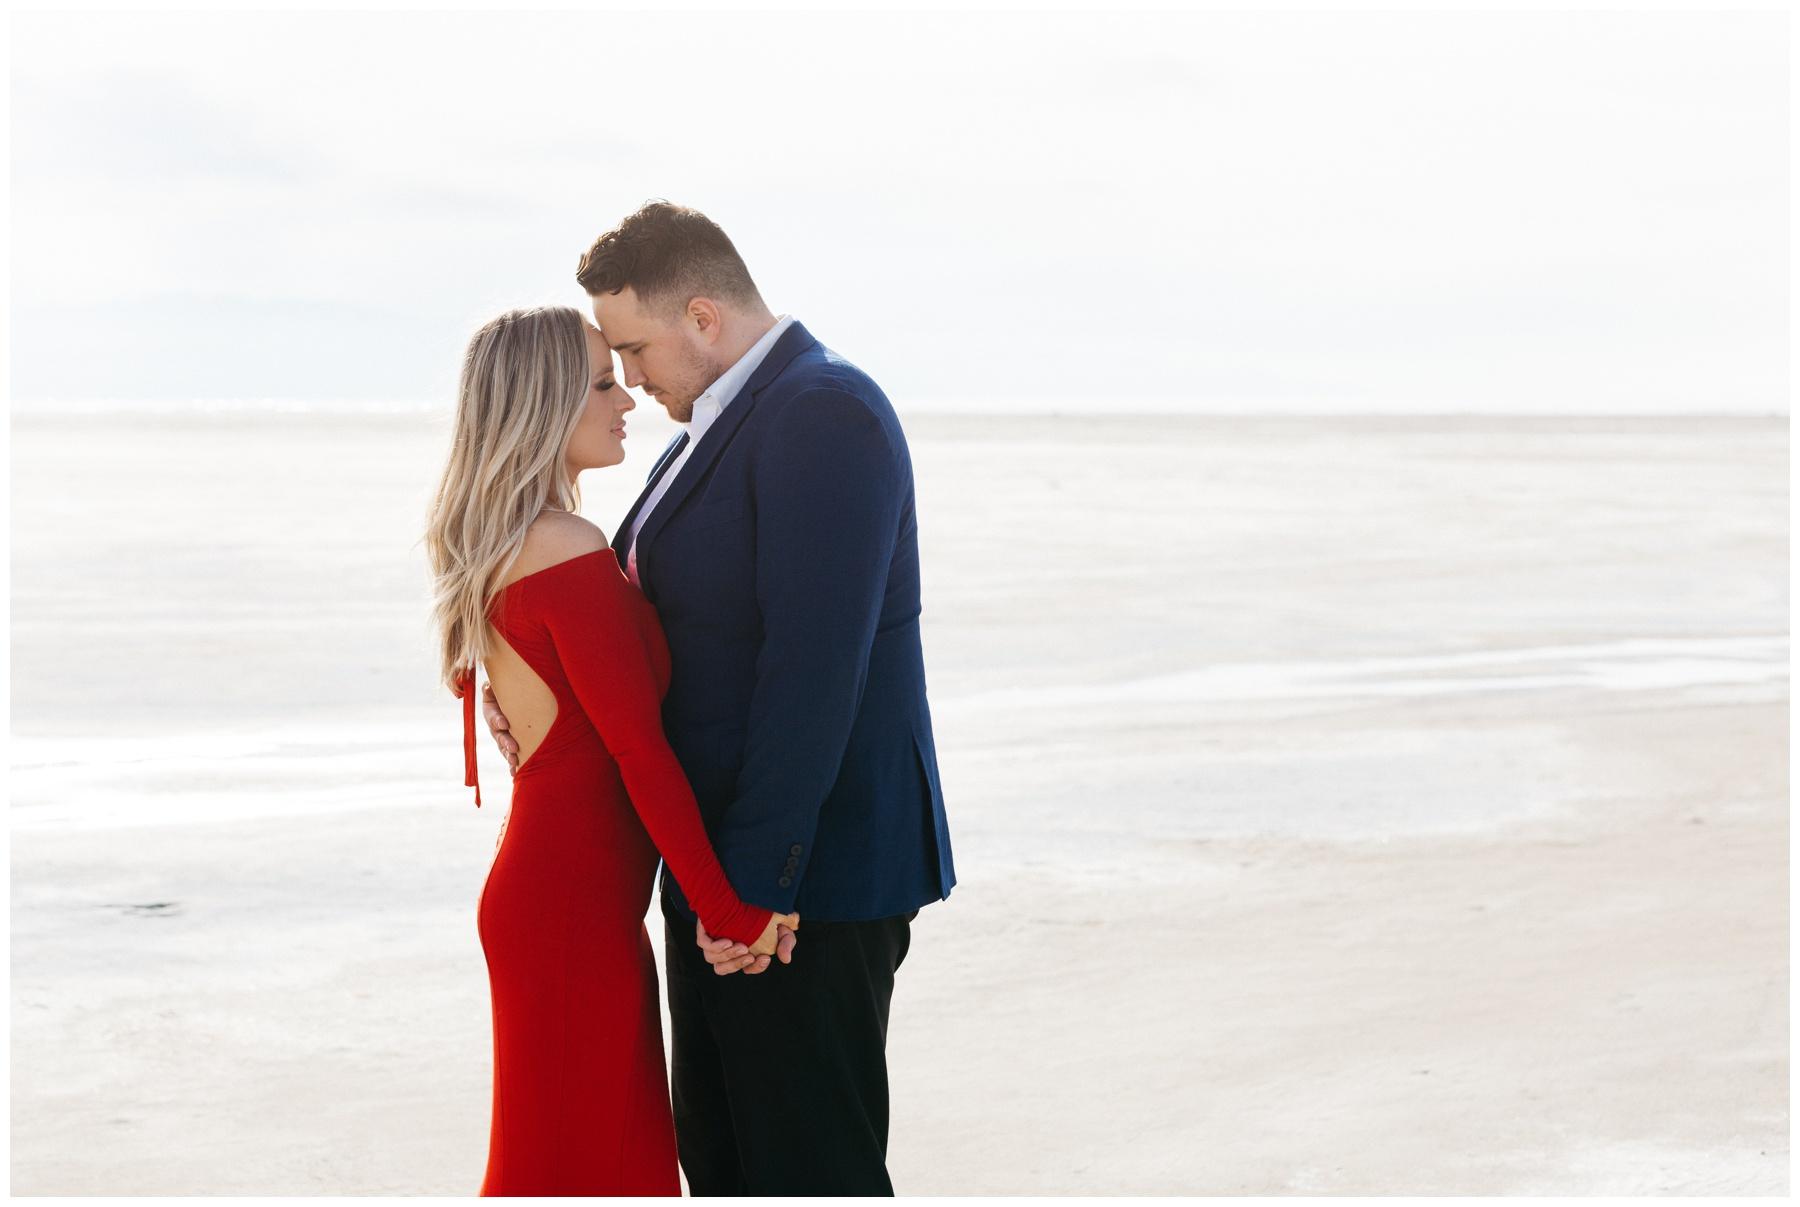 Couples Photoshoot at the Utah Salt Flats